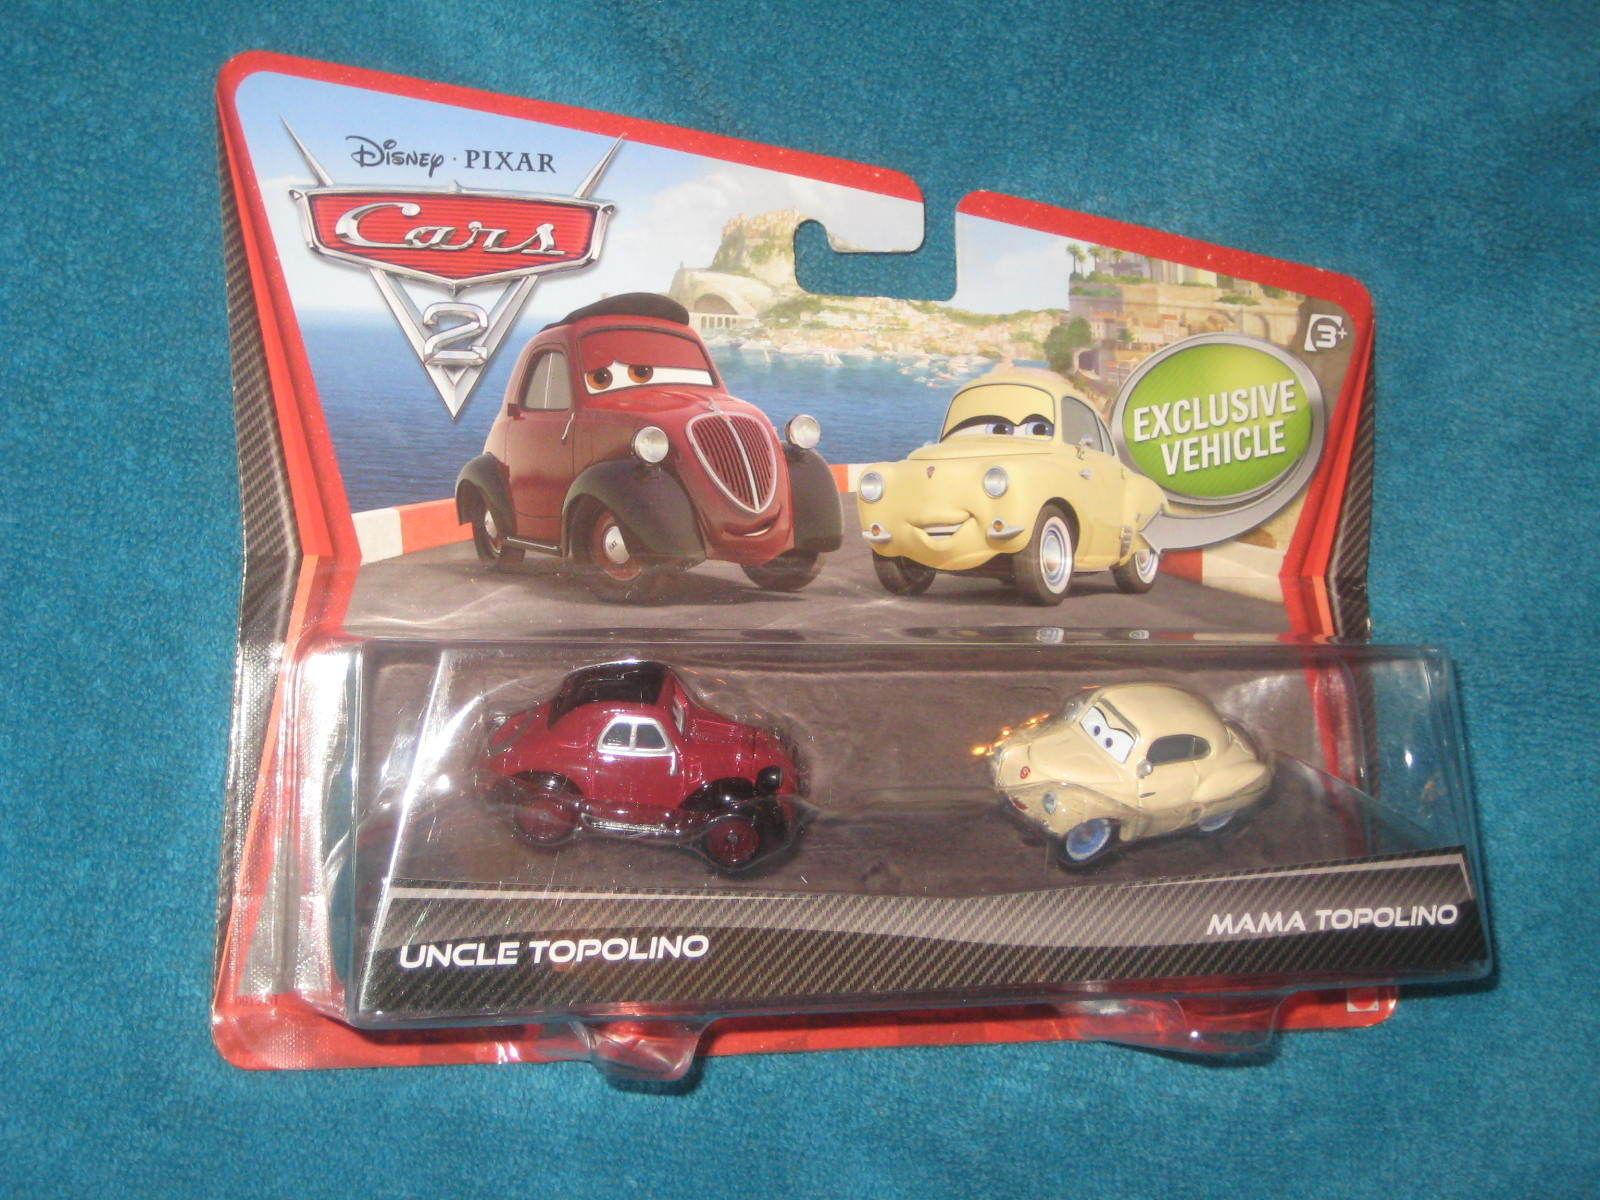 Disney Pixar Cars 2  Uncle Topolino and  Mama Topolino Car Set.